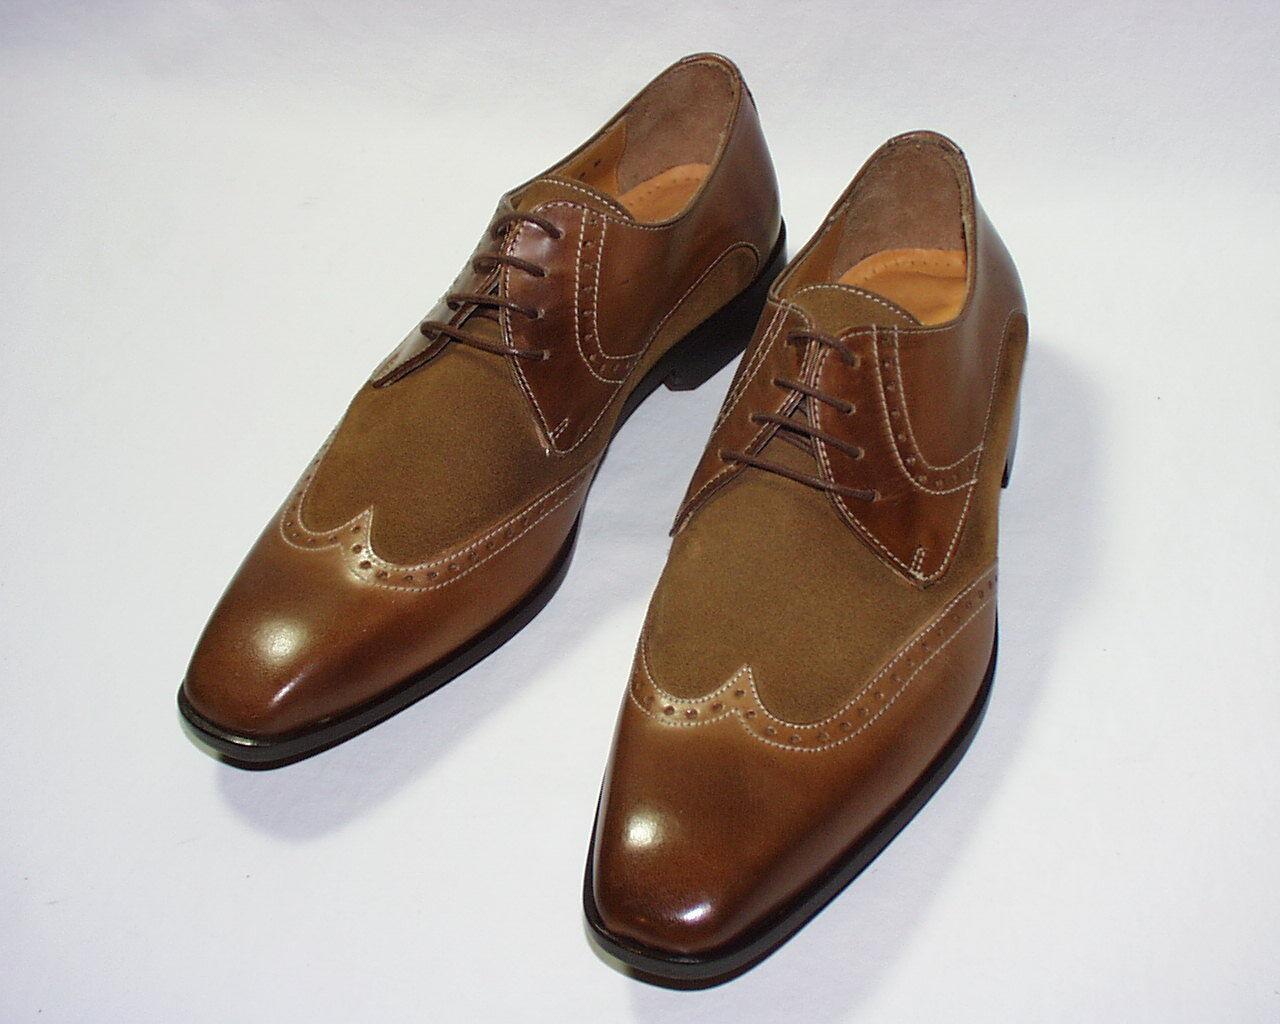 Mercanti Fiorentini Cancun Wingtip Oxford,Leather & Suede Upper, Brandy, 8, New